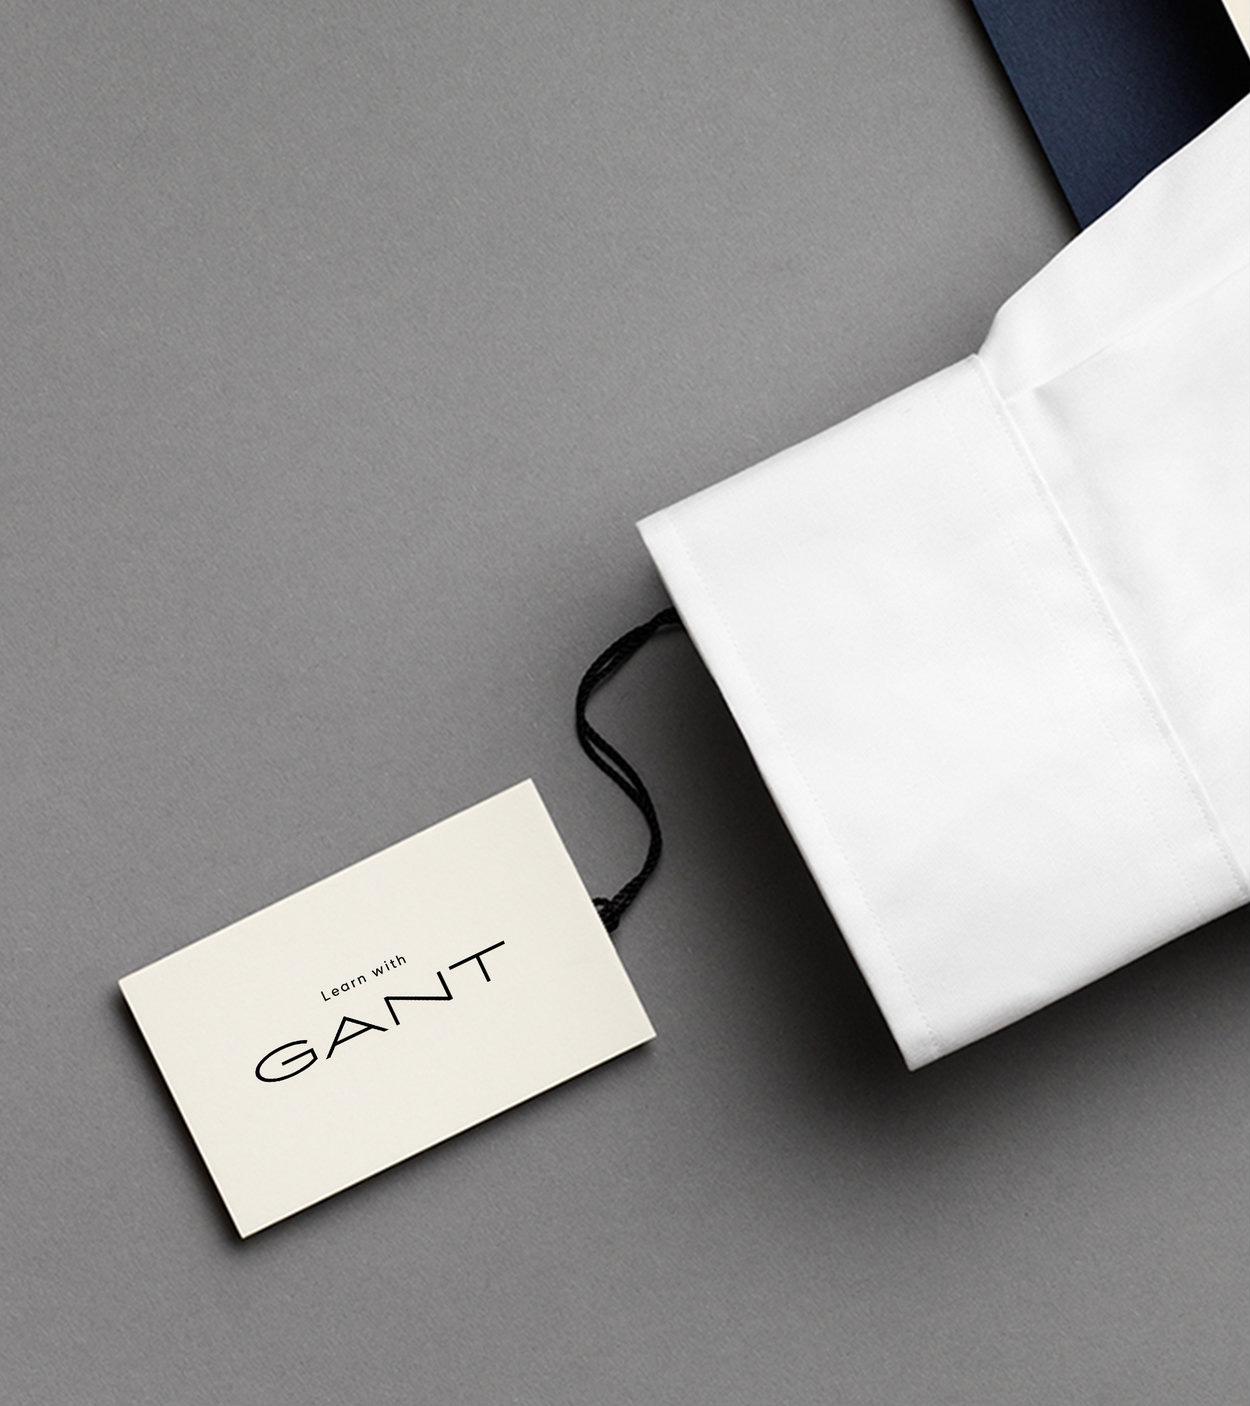 GANT_Tags-1.jpg